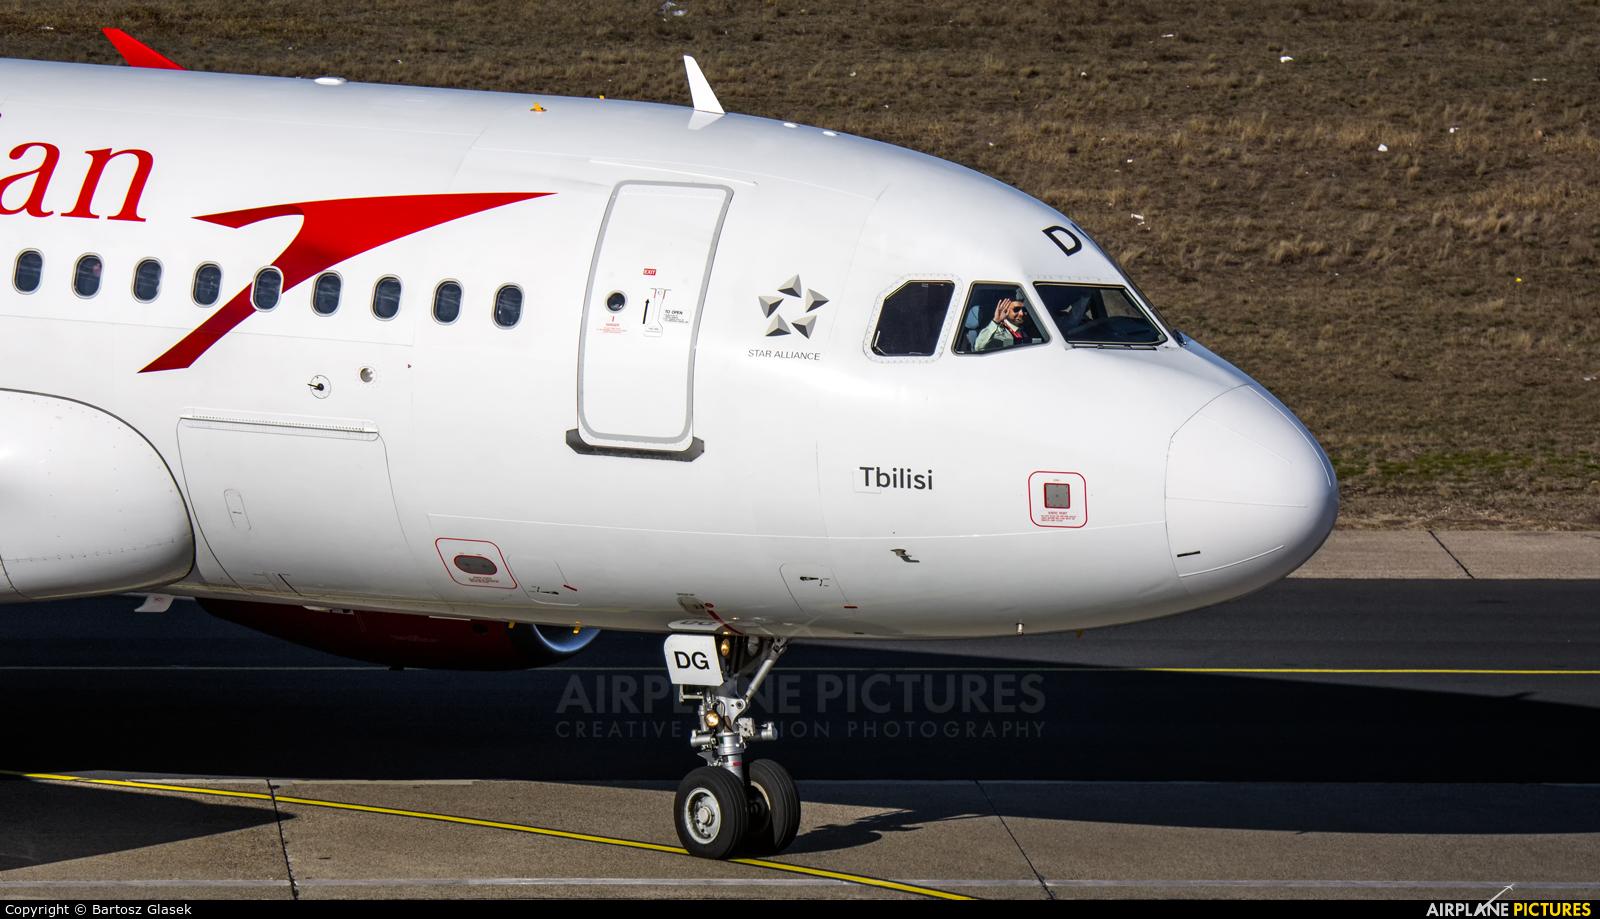 Austrian Airlines/Arrows/Tyrolean OE-LDG aircraft at Berlin - Tegel